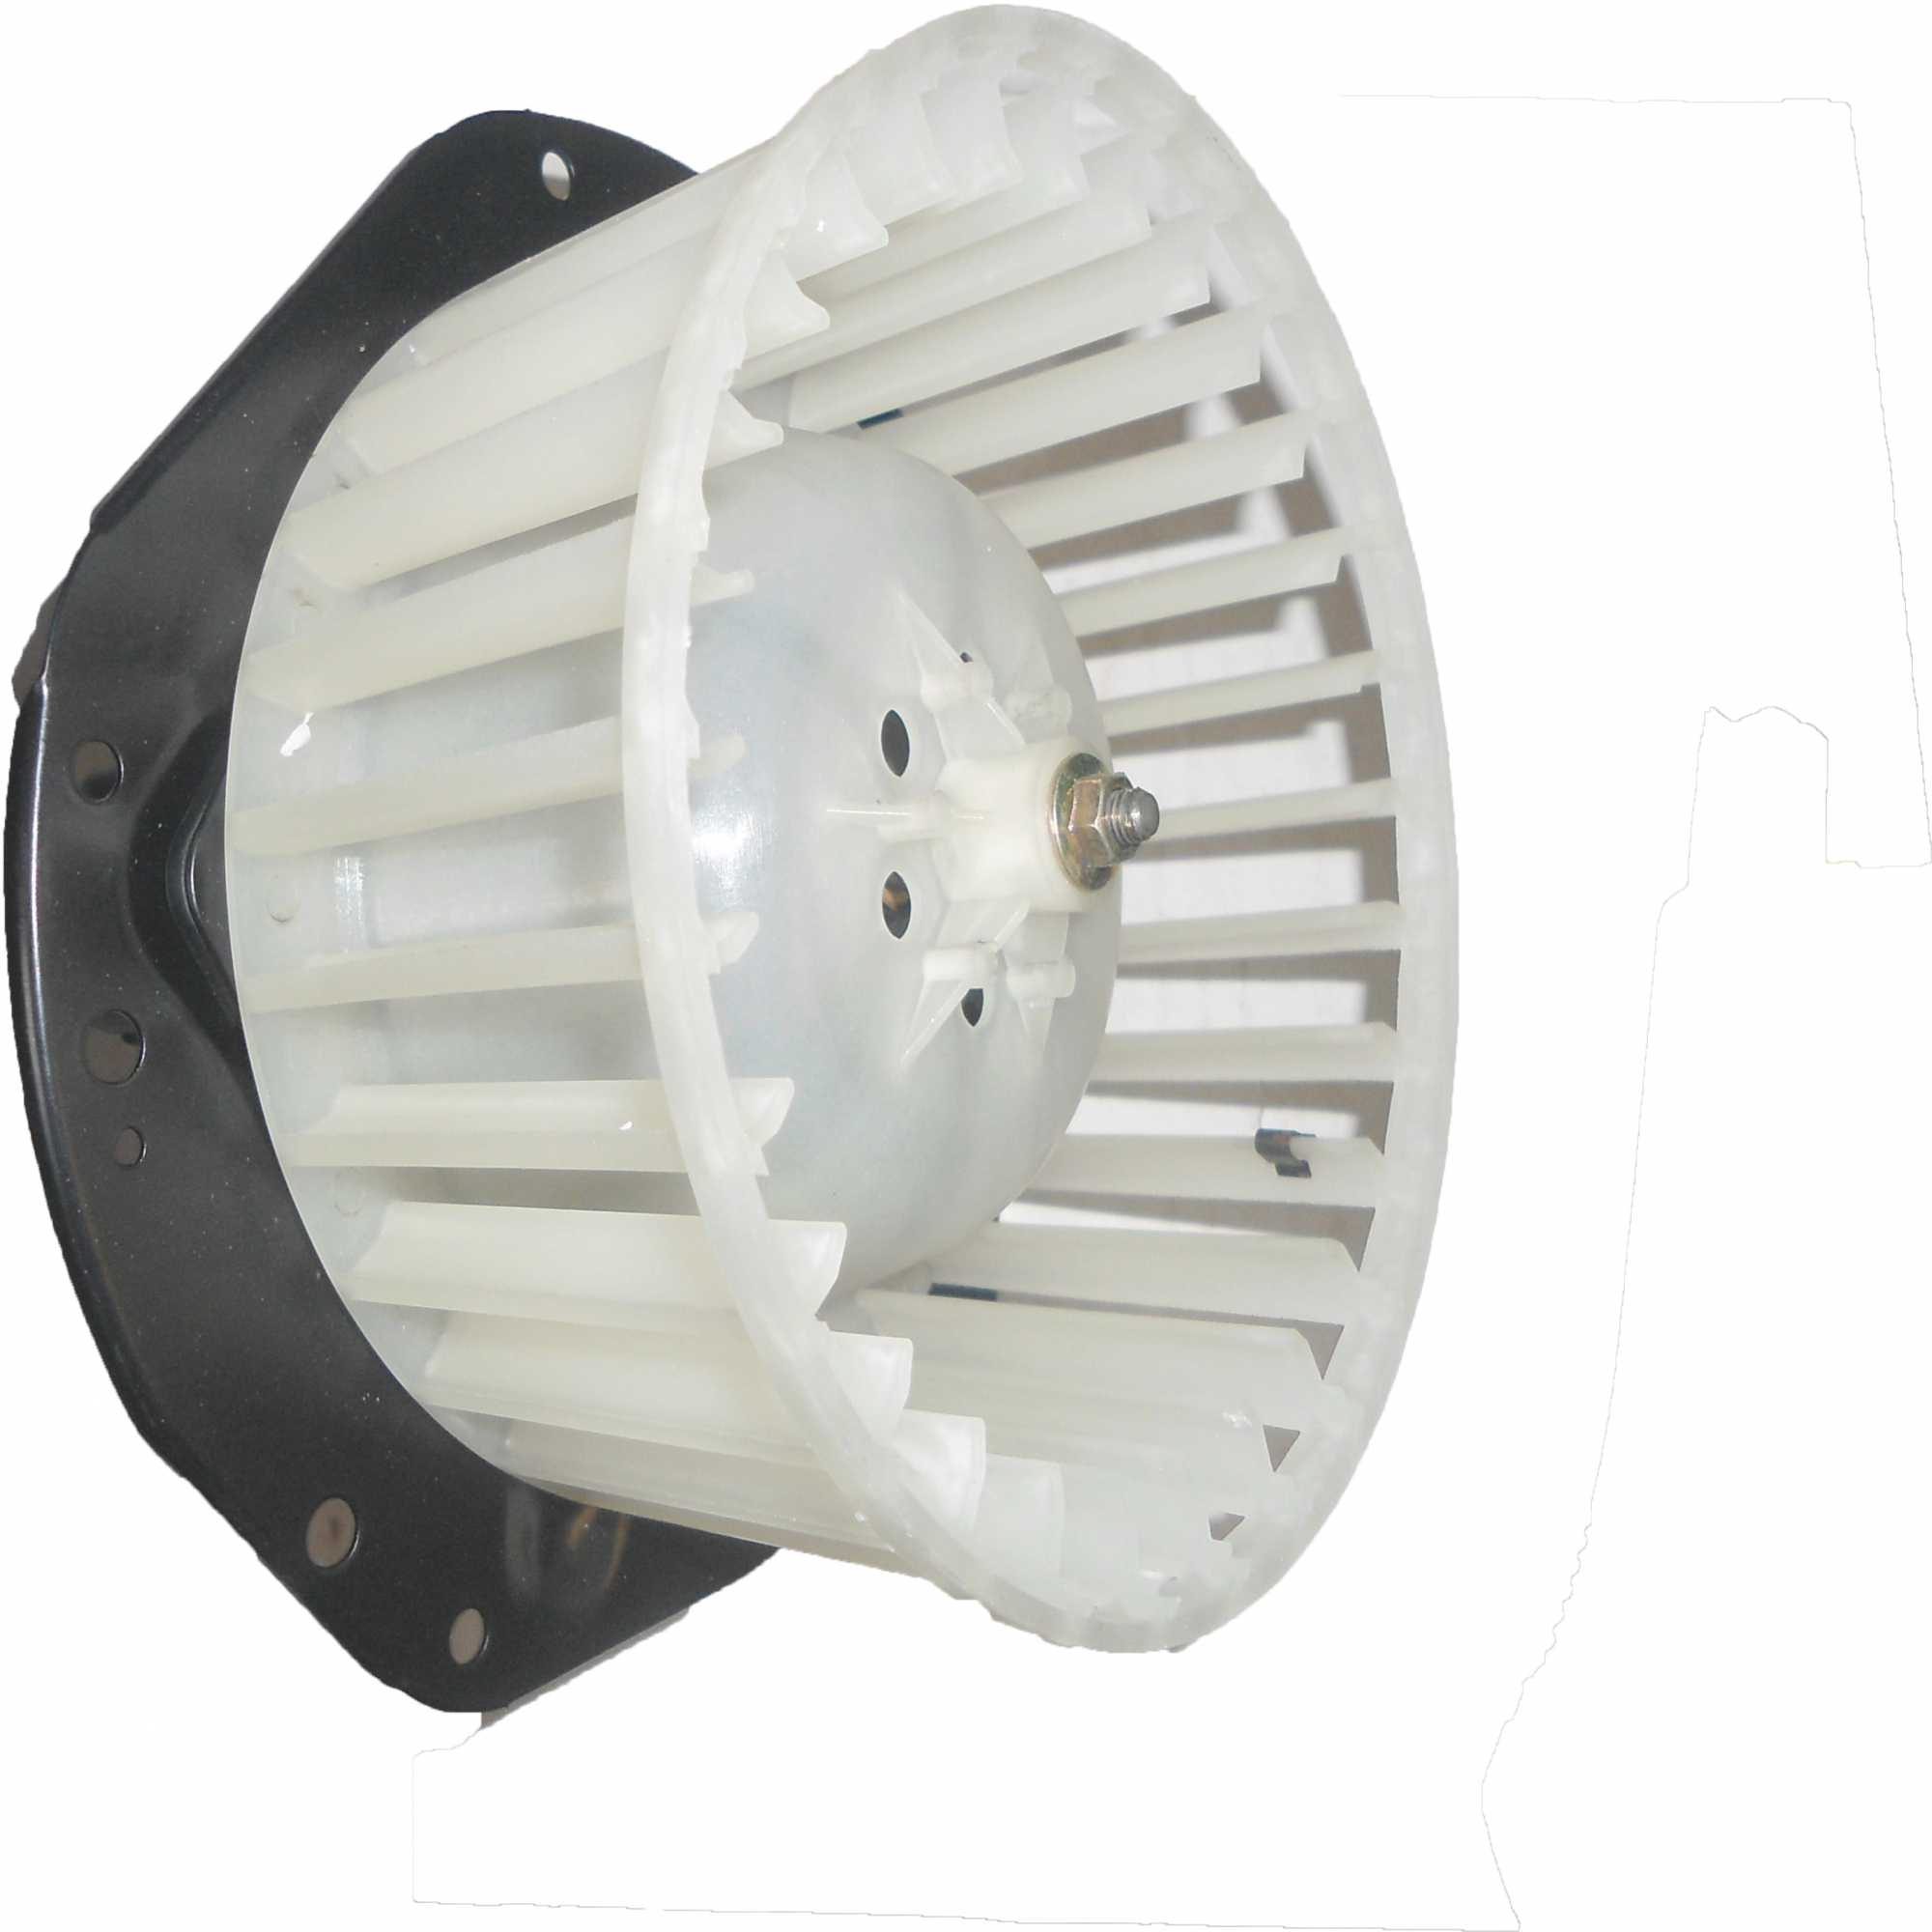 Motor Caixa Evaporadora - Monza/Kadet/Ipanema C/Ar